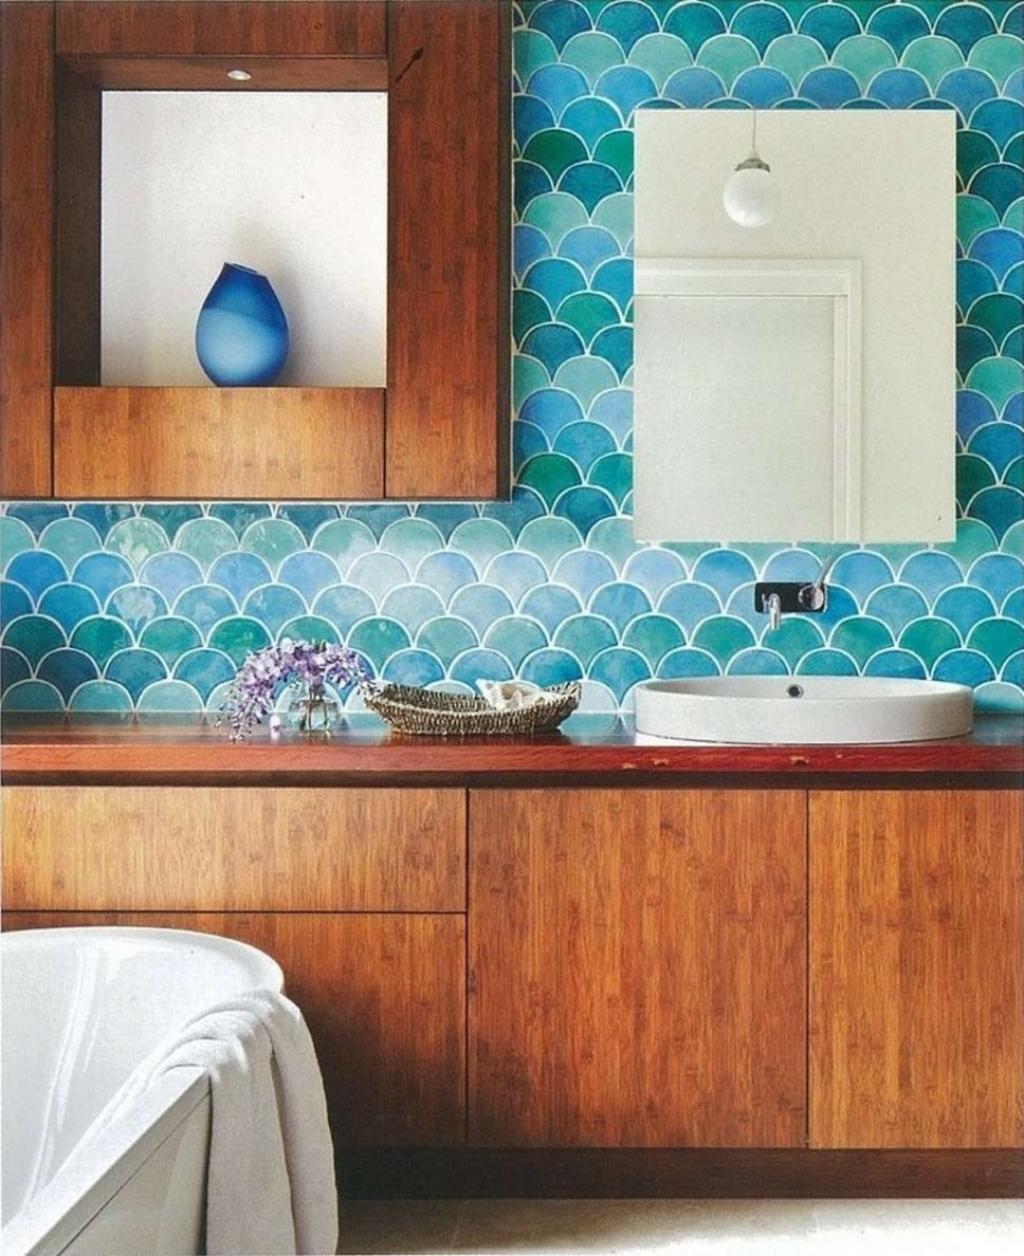 eclectic-bathroom-ideas-2-eclectic-bathroom-cool-decor-idea-in-melbourne